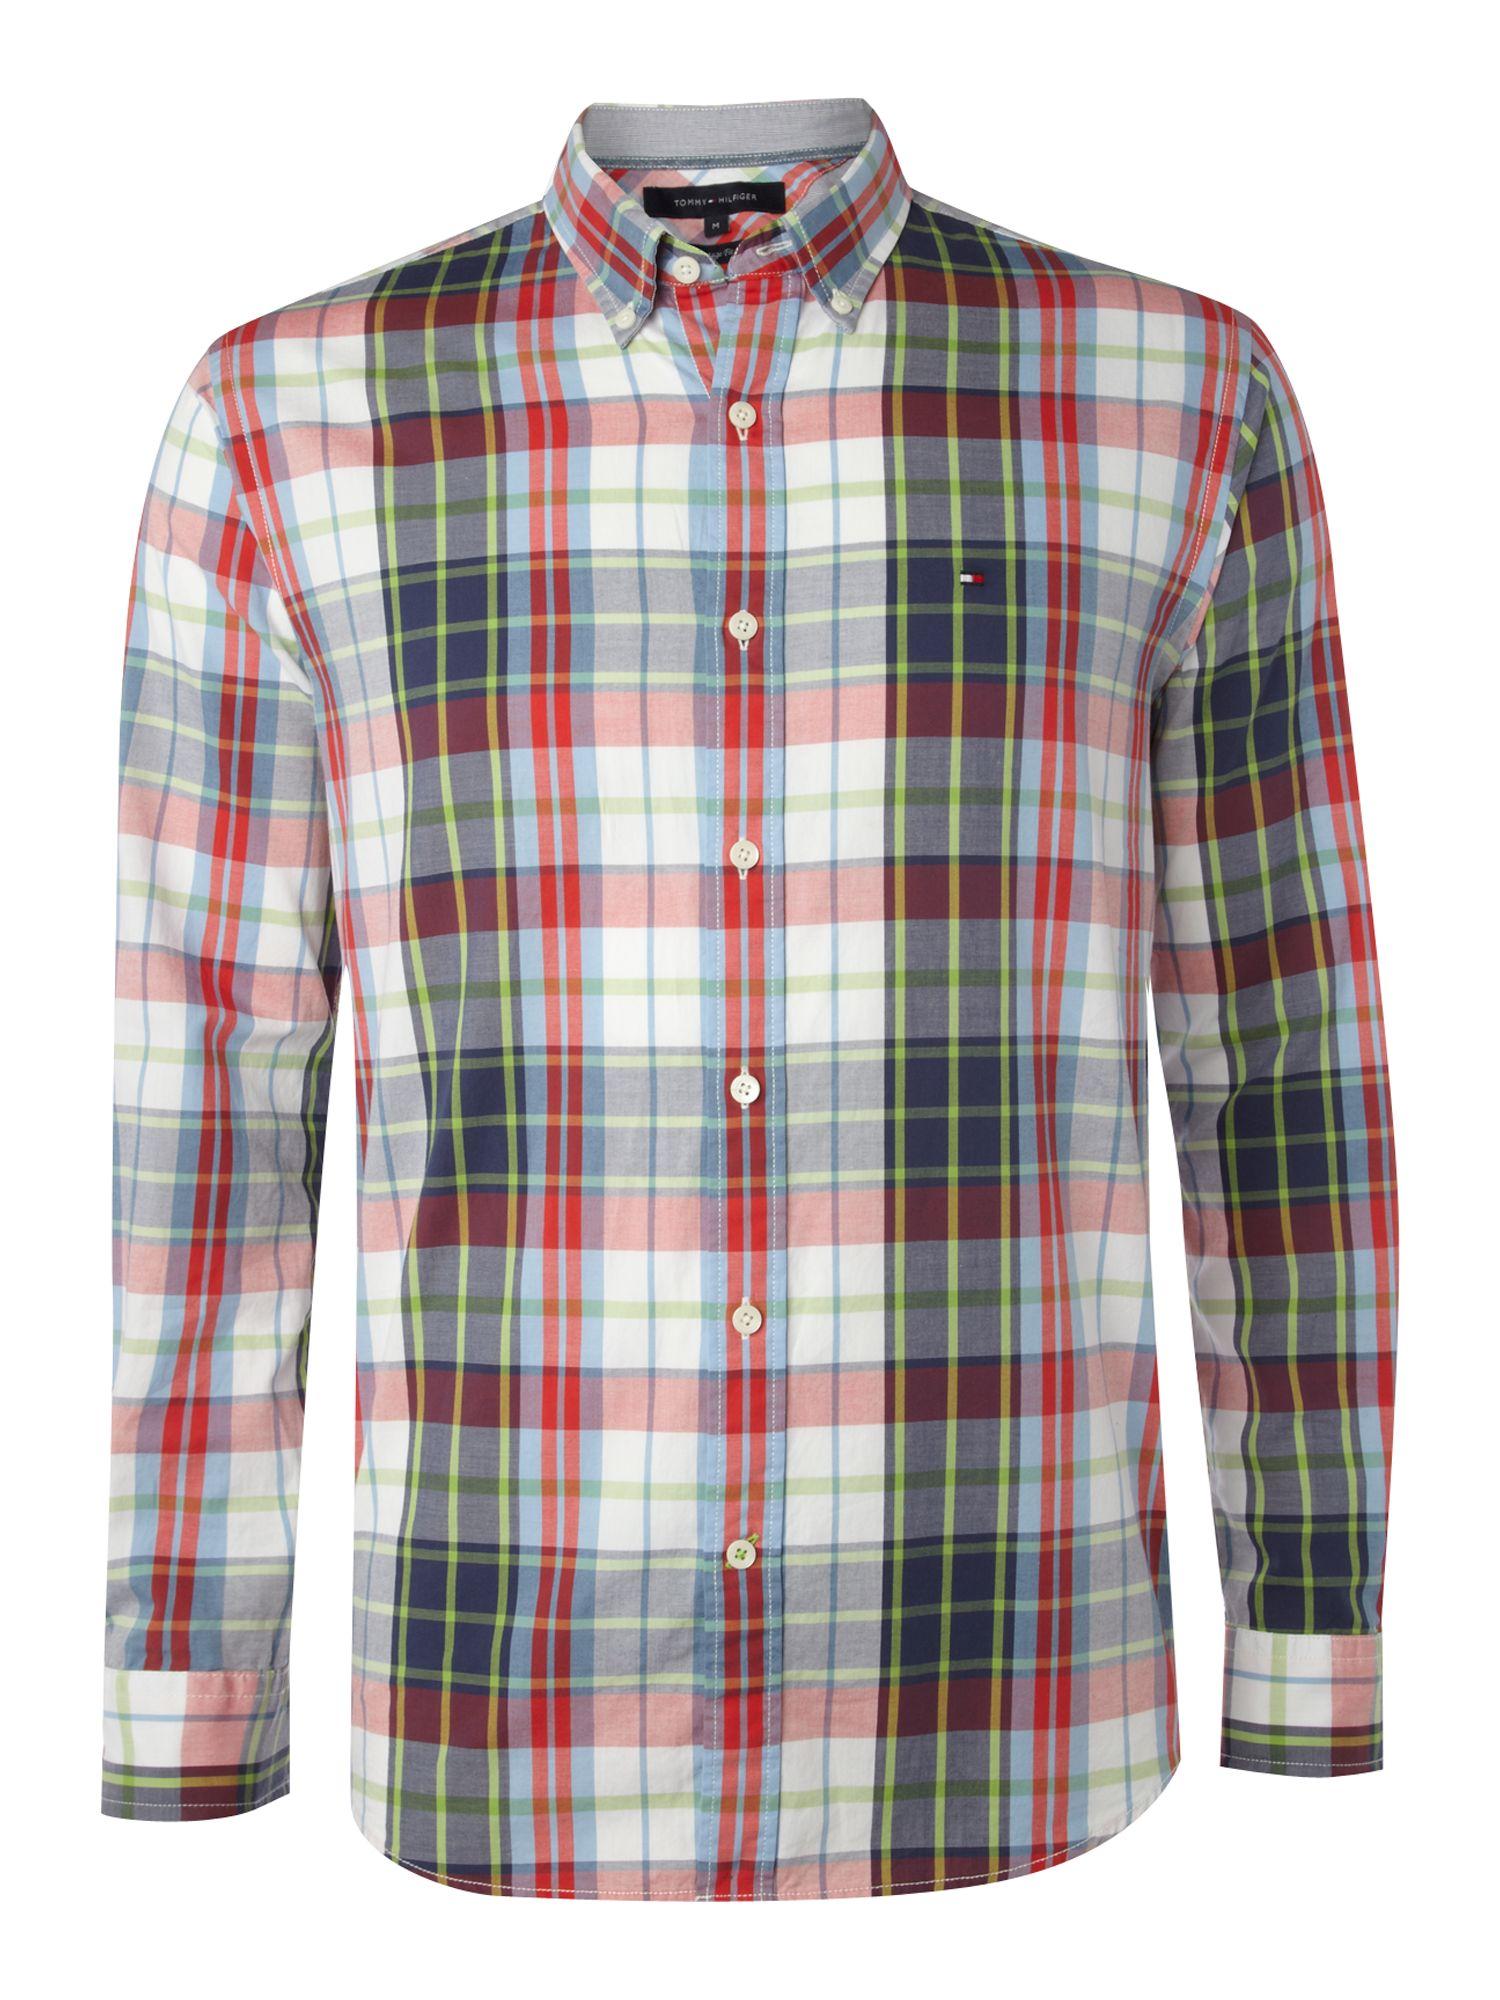 Tommy hilfiger check vintage fit shirt in blue for men lyst for Tommy hilfiger vintage fit shirt